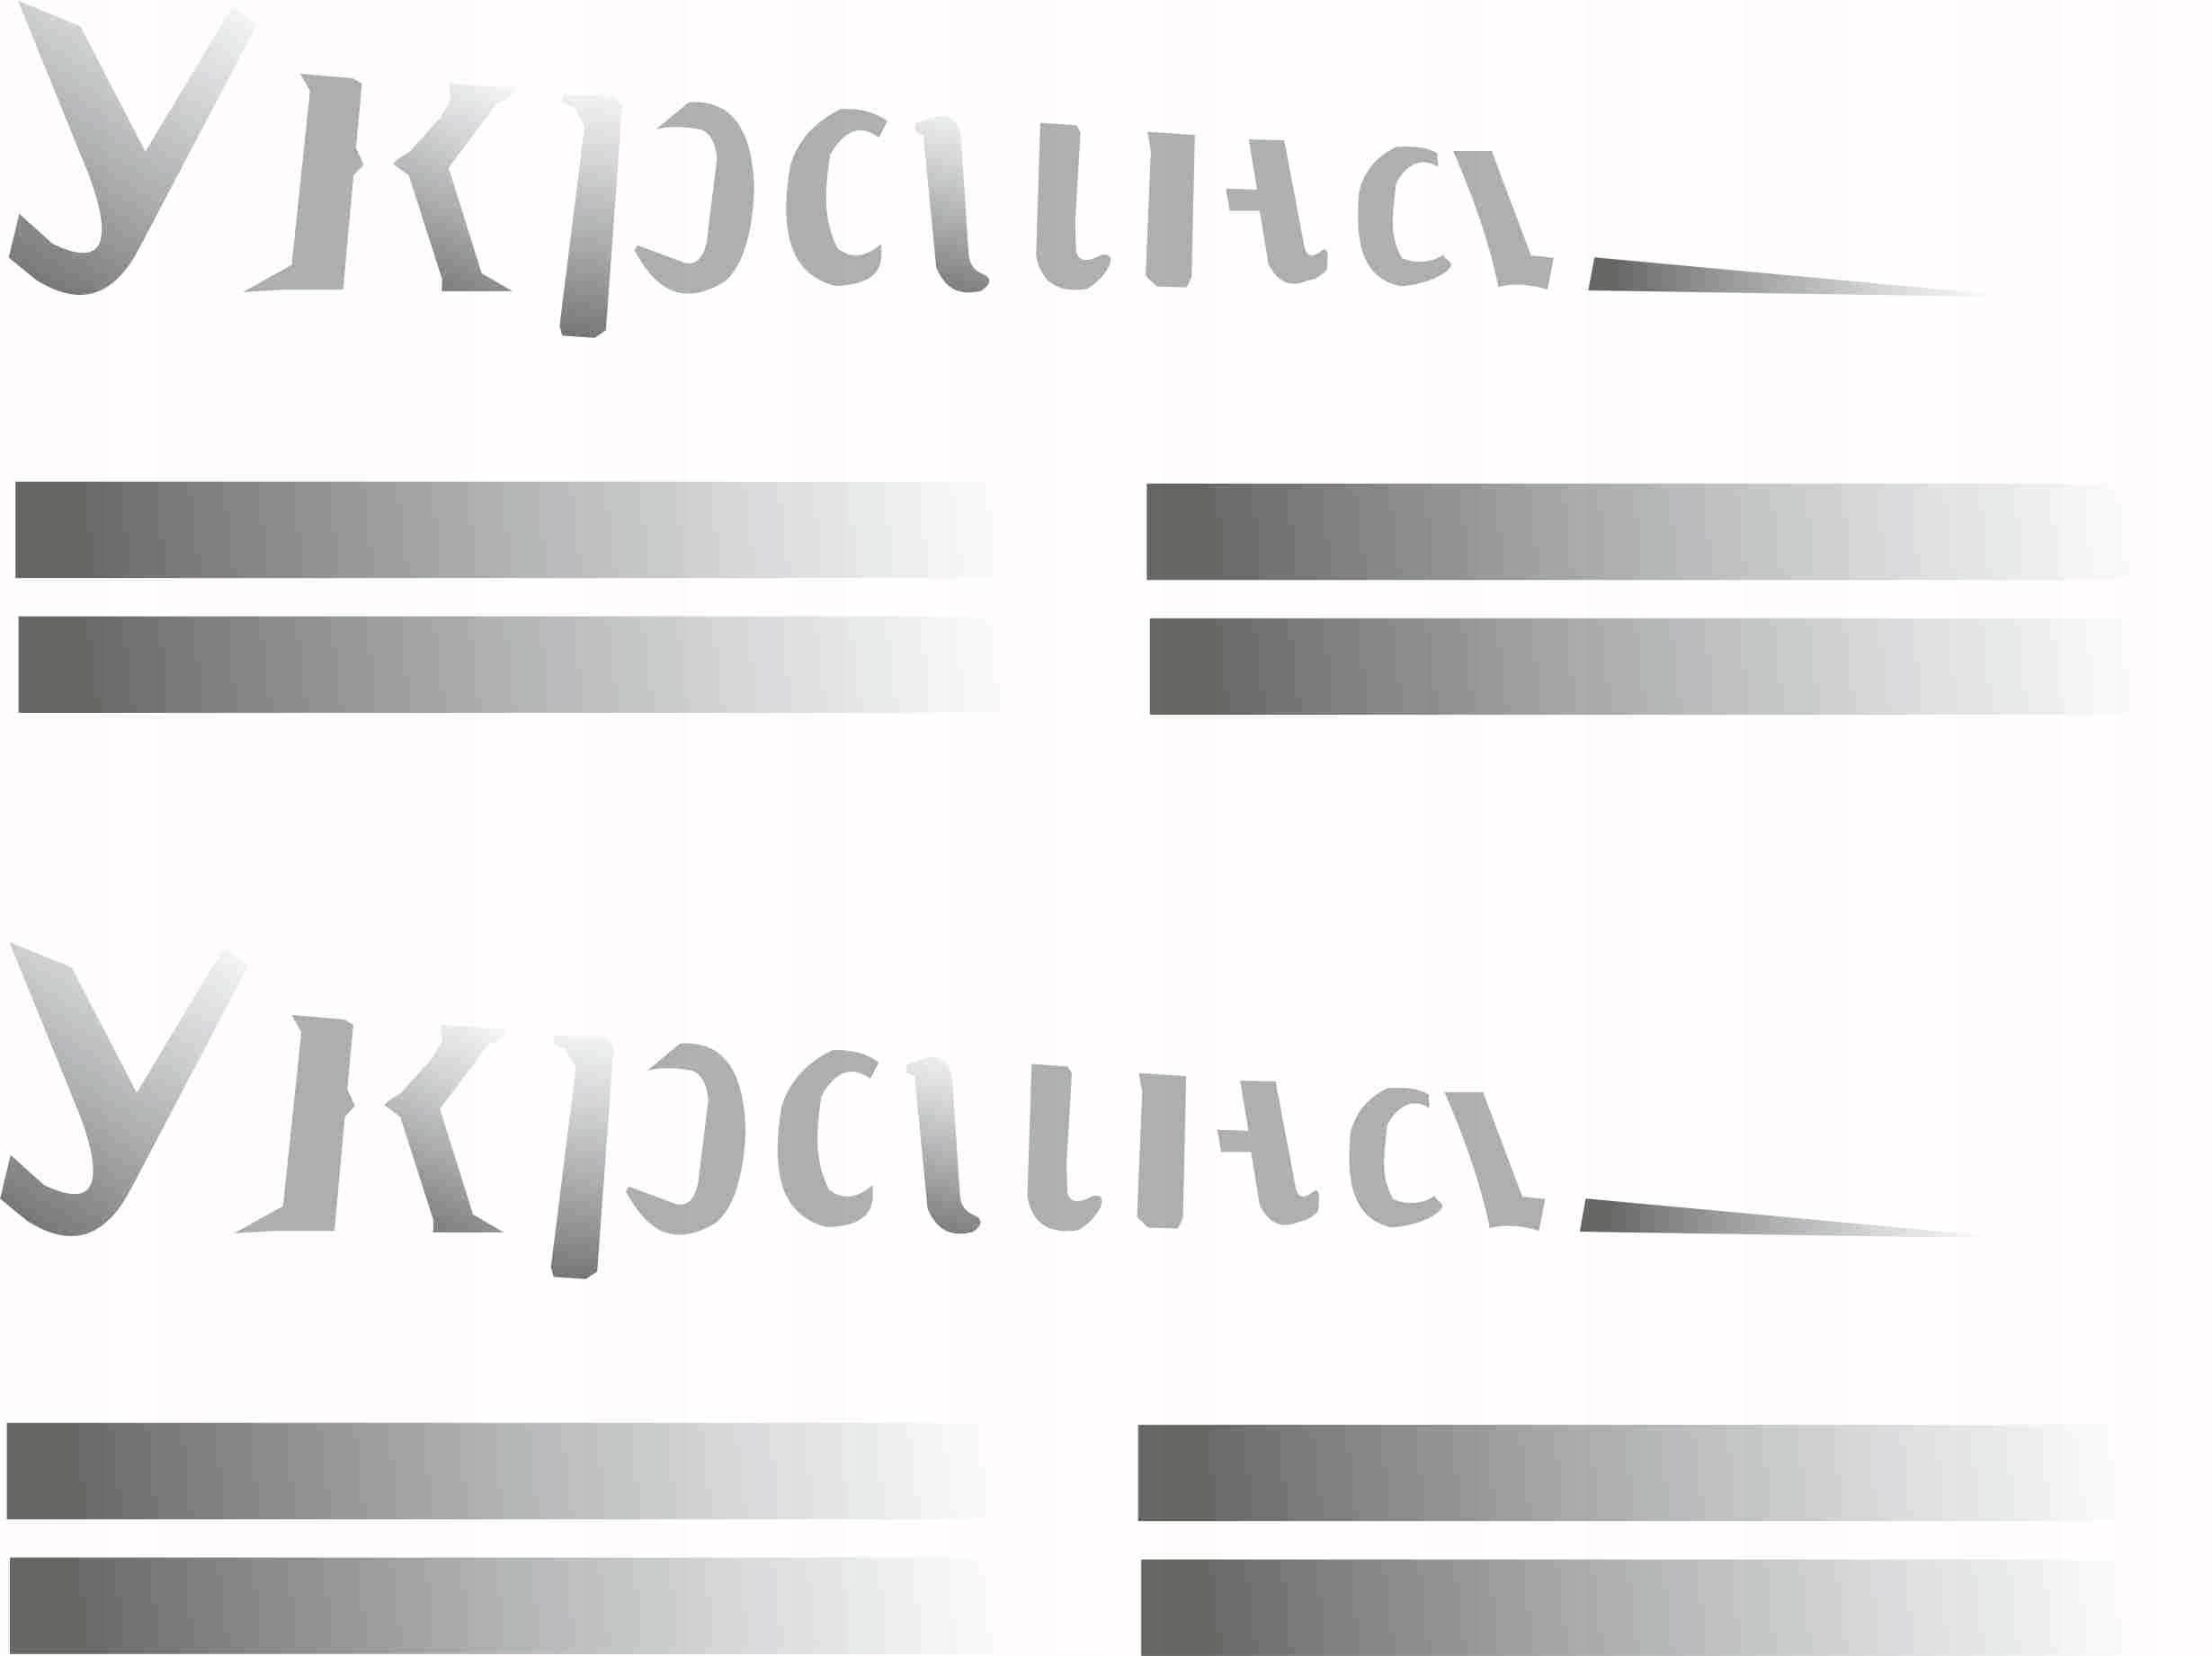 Ukraina 187r Srebrne Naklejki Rower Rozne Kolory 7225270812 Allegro Pl